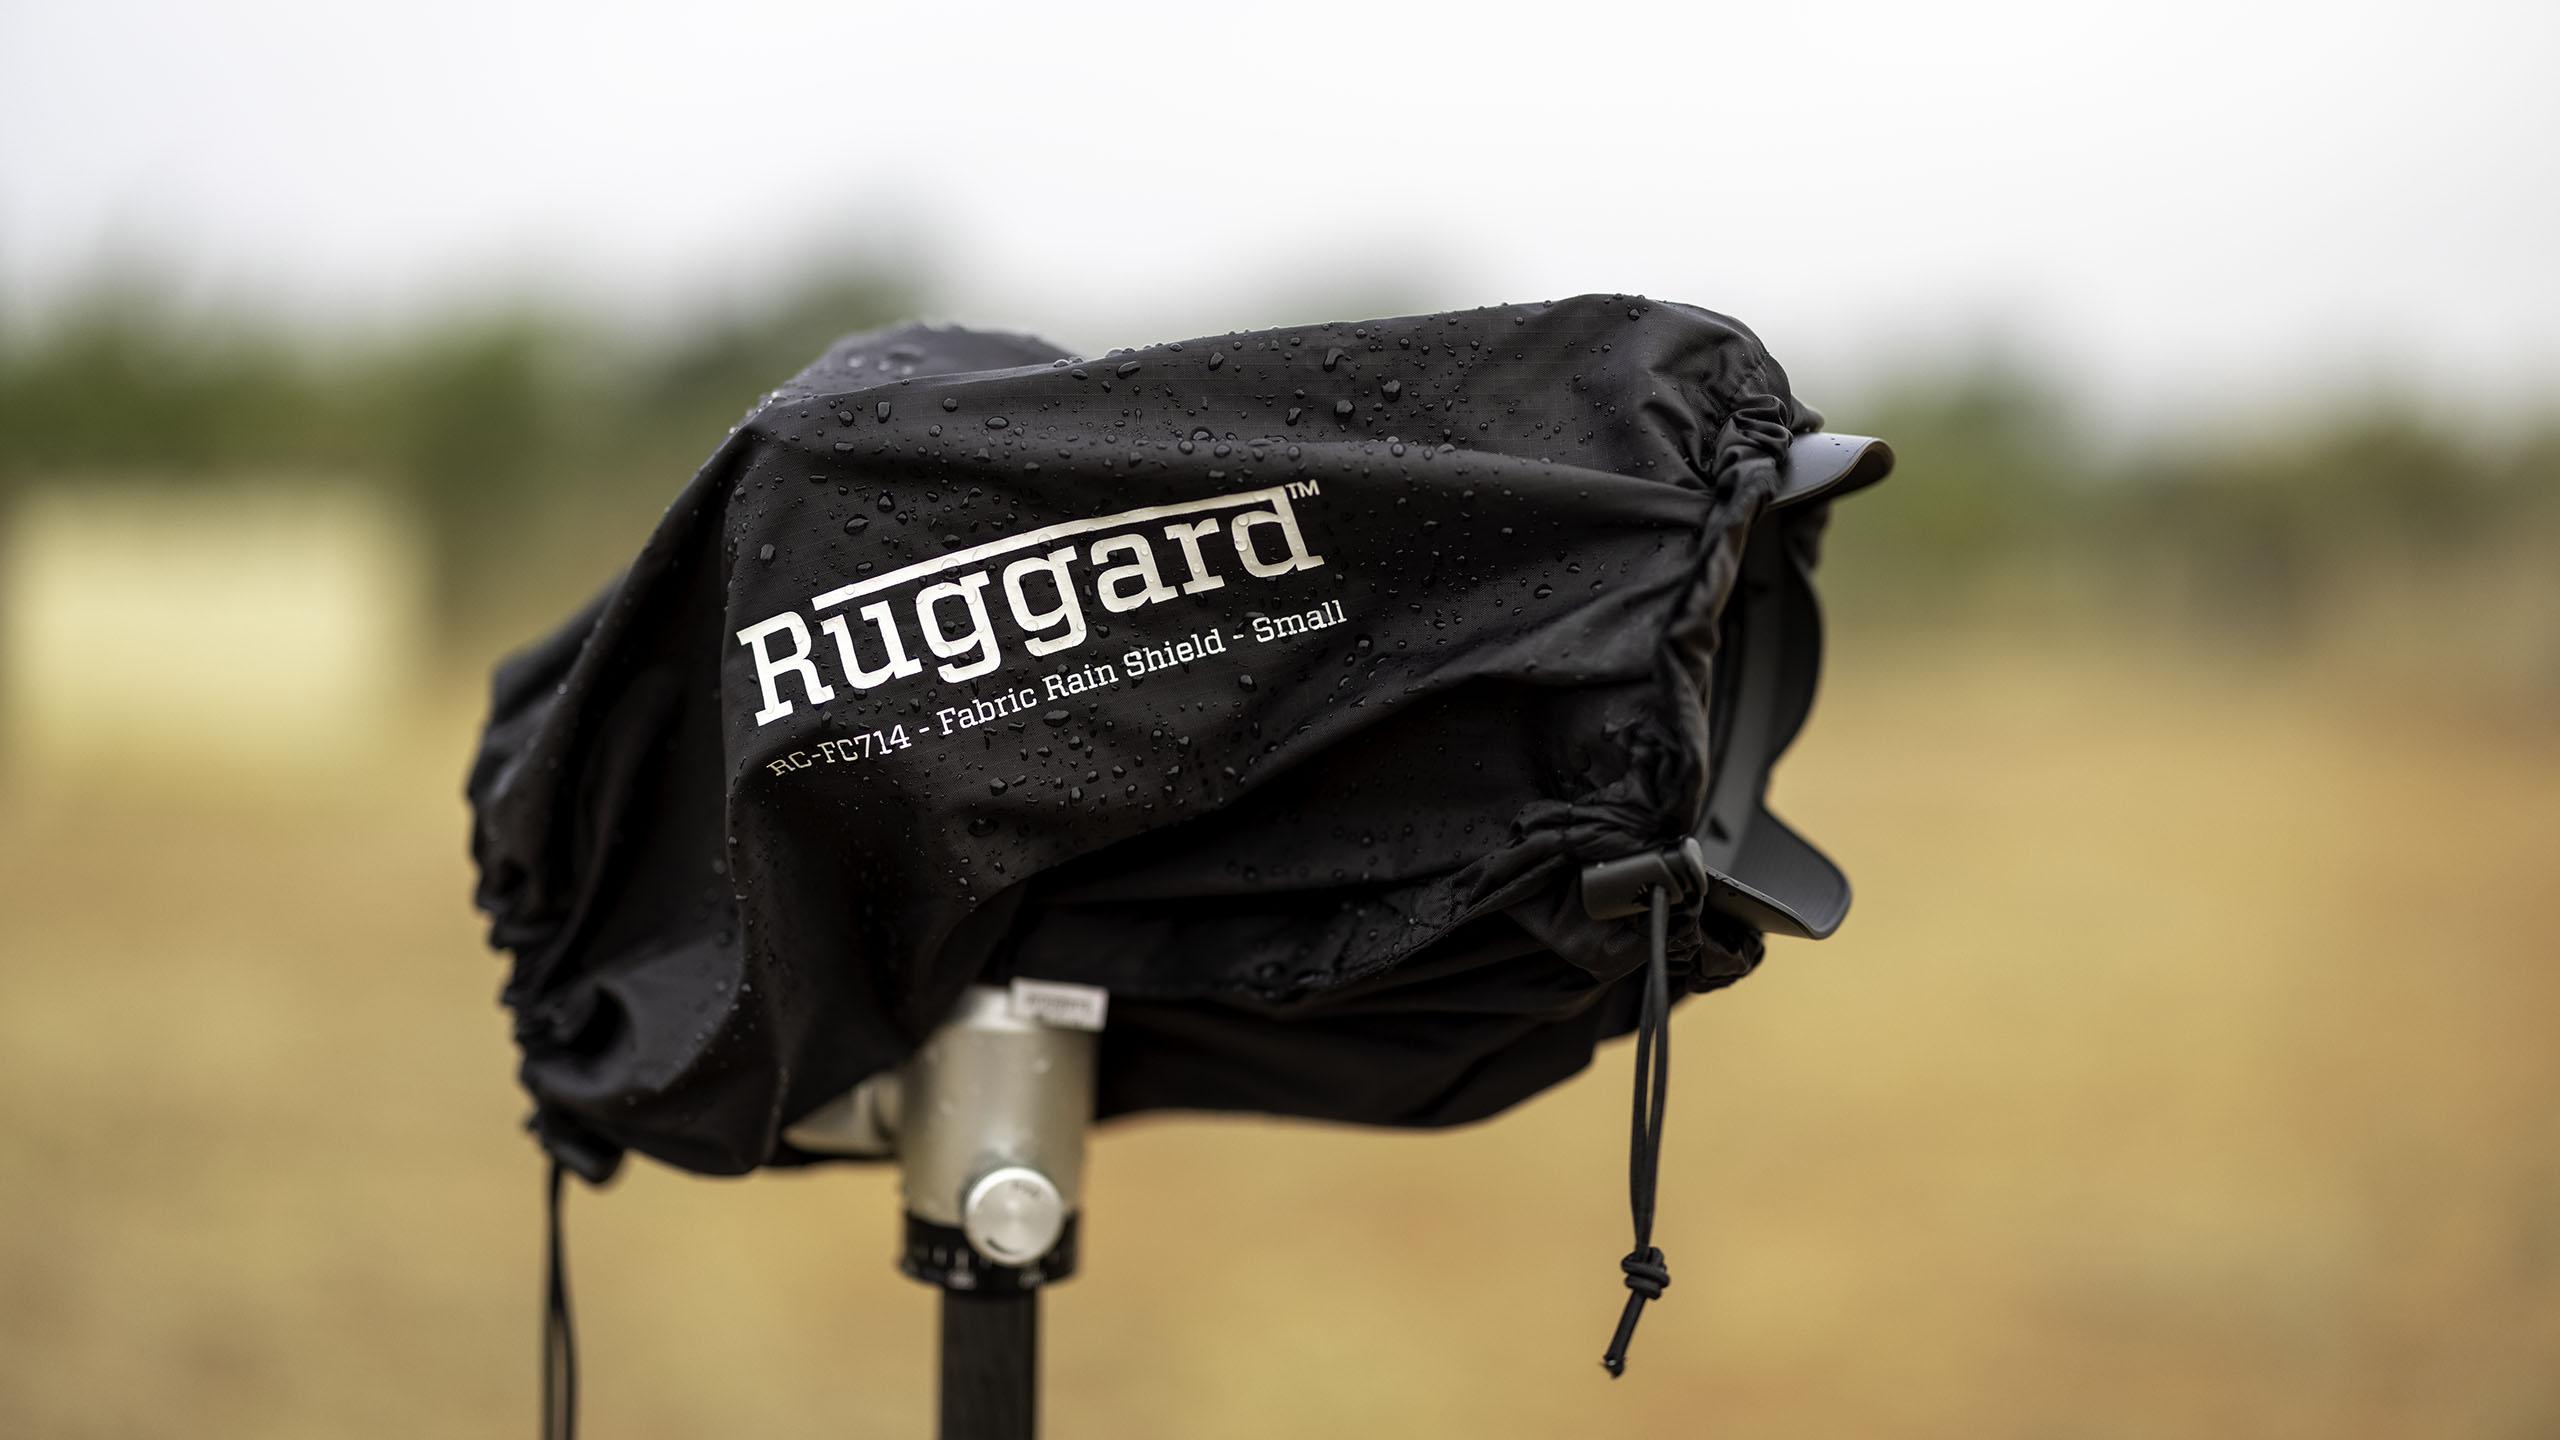 Brett Day Ruggard Rain Shield 2560 1440